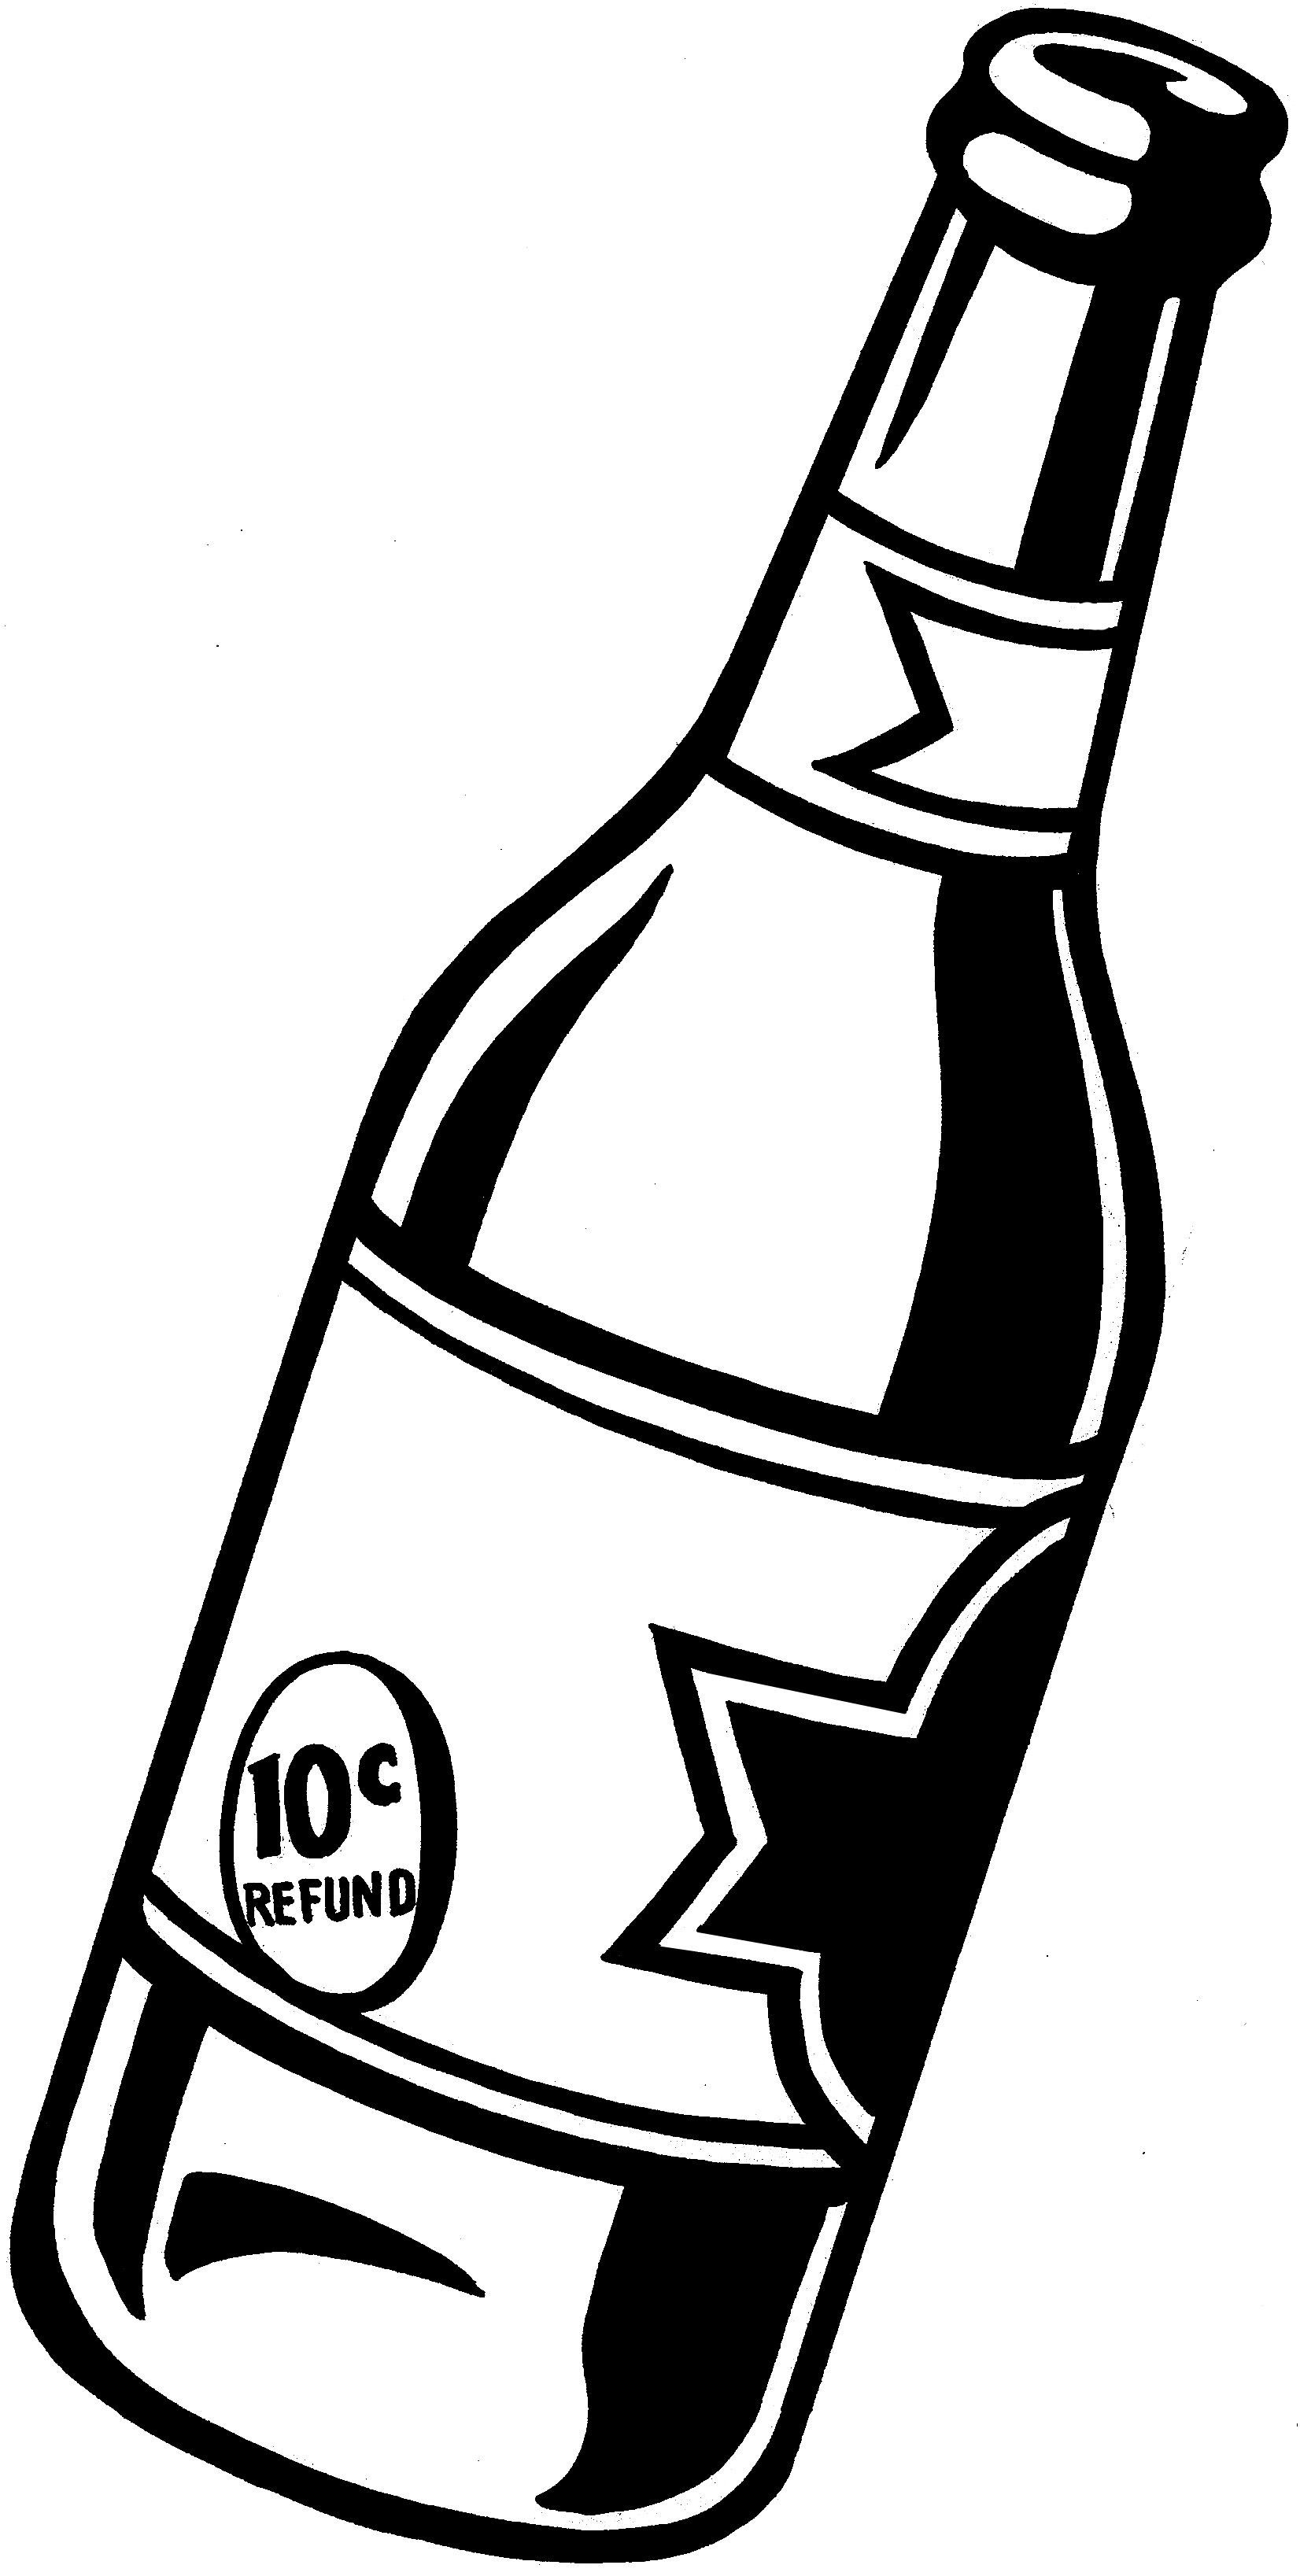 Alcohol bottle clipart black and white 1 » Clipart Portal.